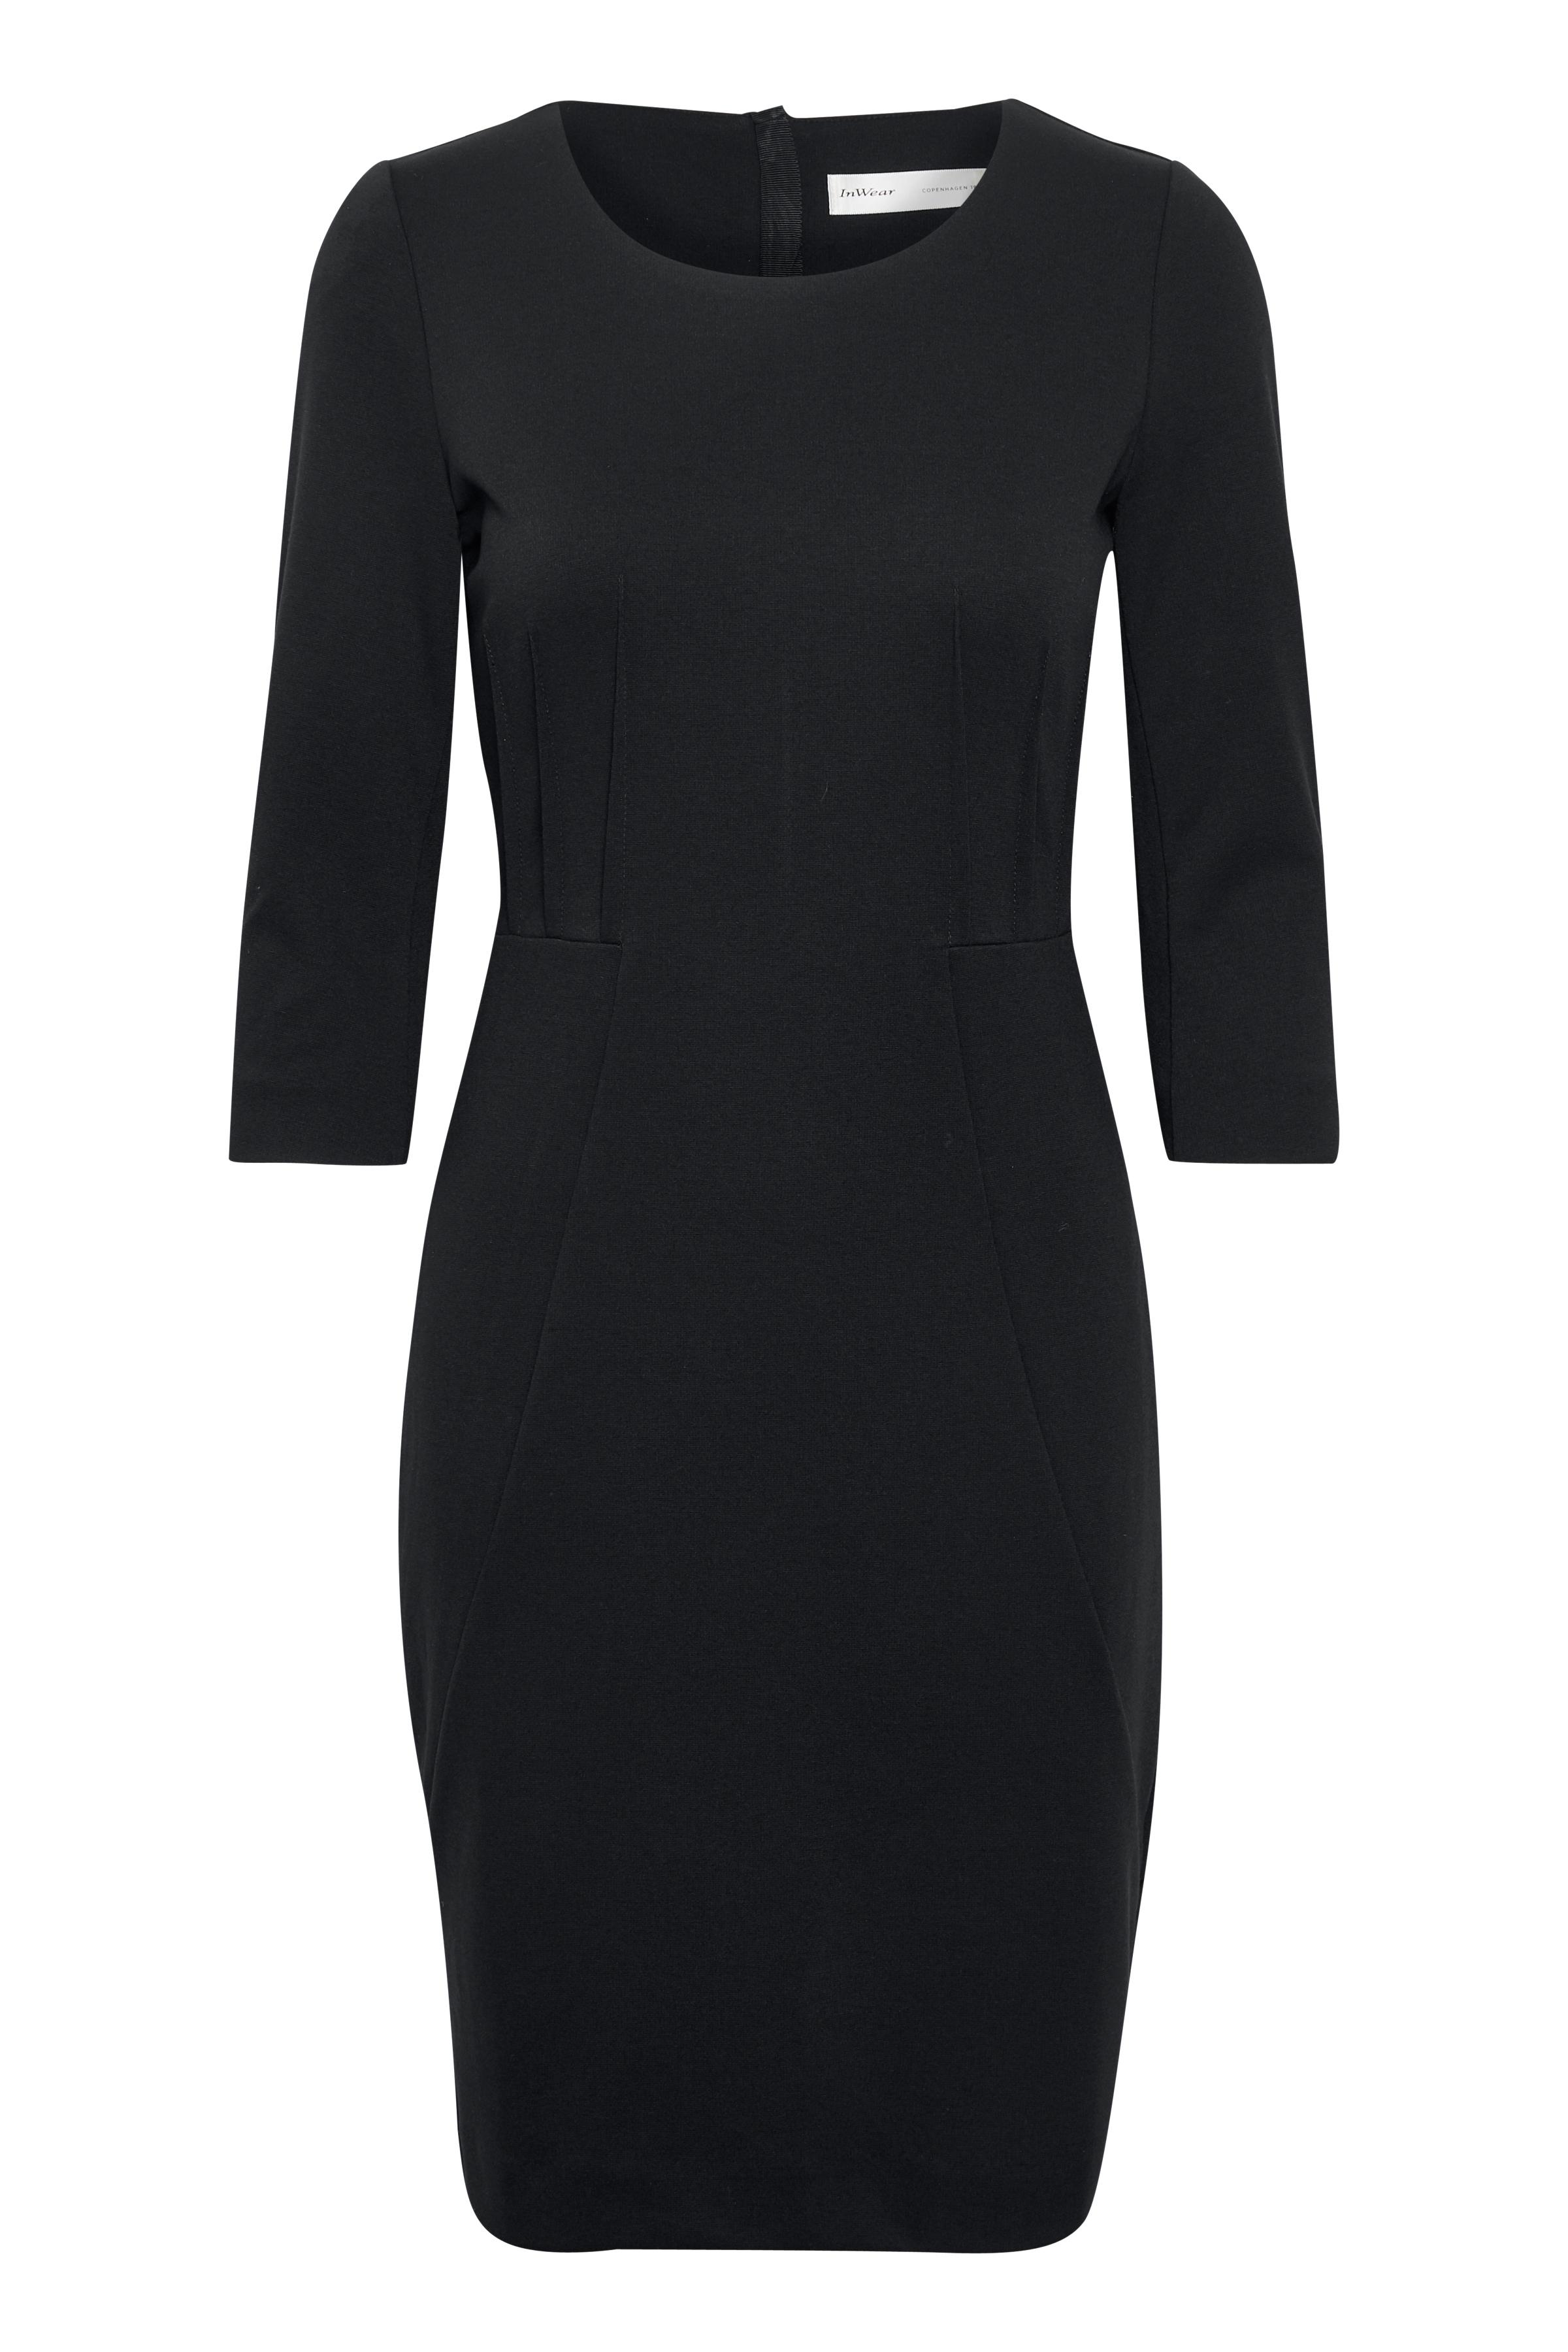 Black Jerseykjole – Køb Black Jerseykjole fra str. S-L her